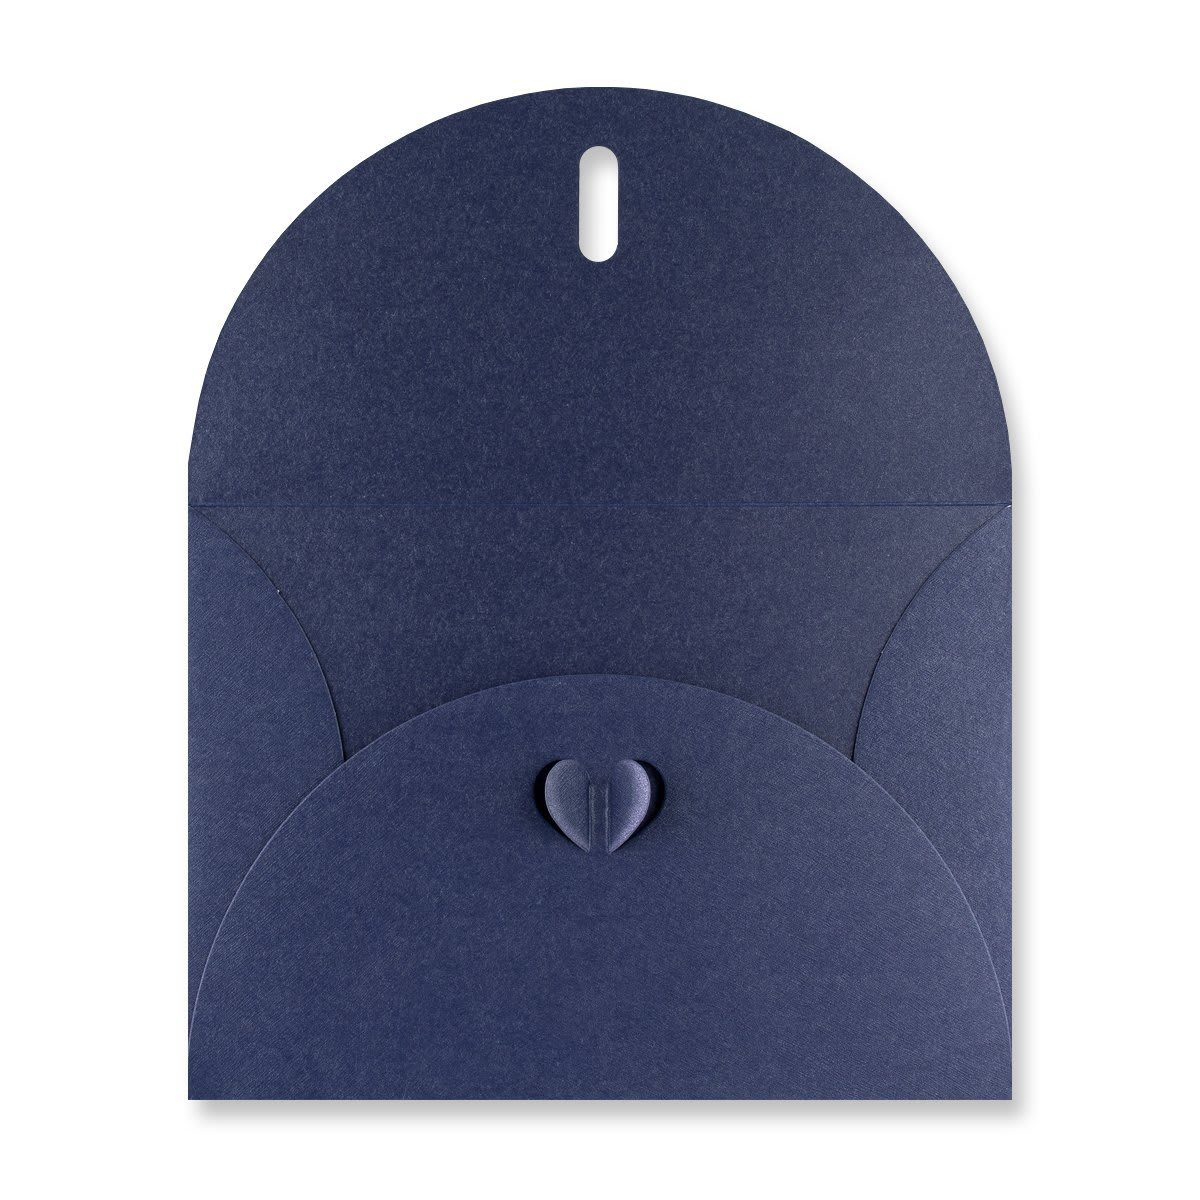 C5 MIDNIGHT BLUE BUTTERFLY ENVELOPES